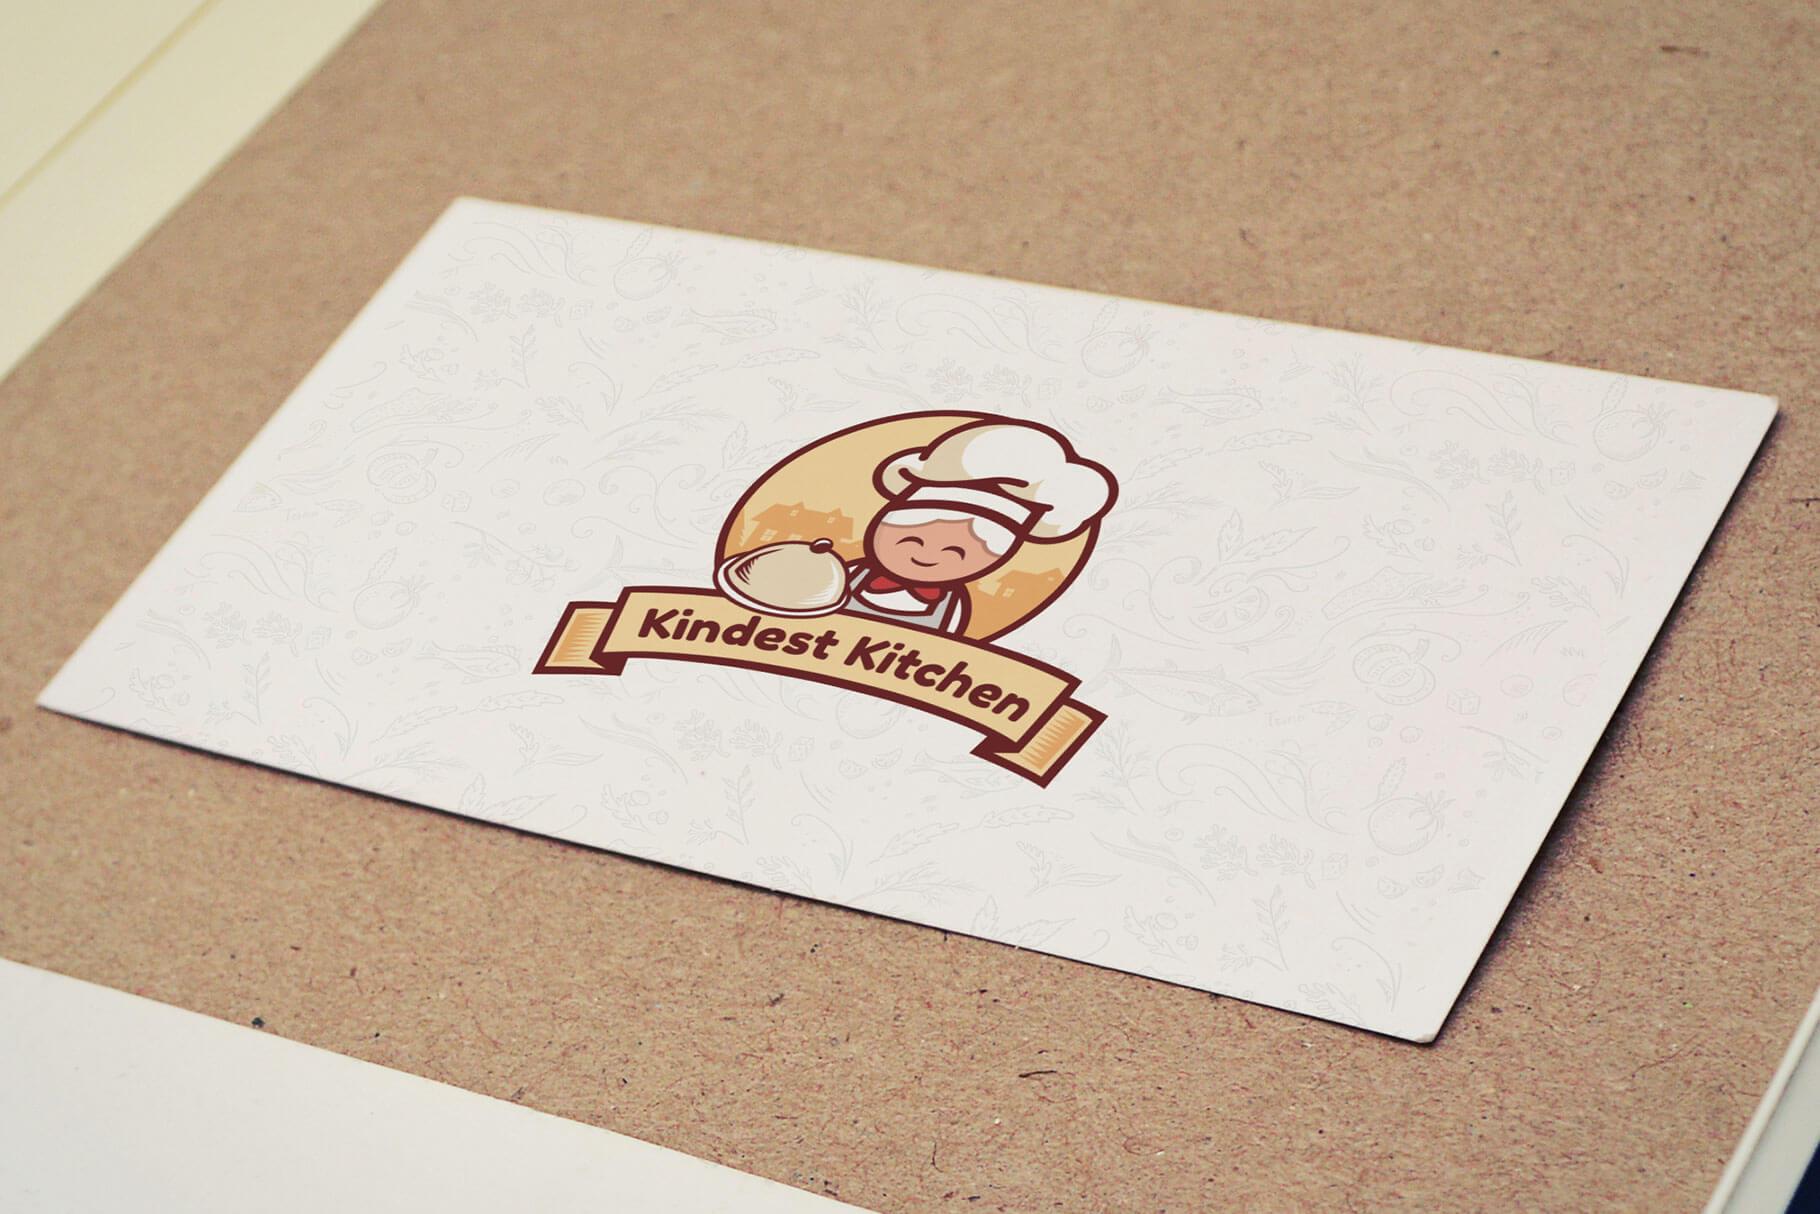 Restaurant logo design by europe graphics. Food company logo design.